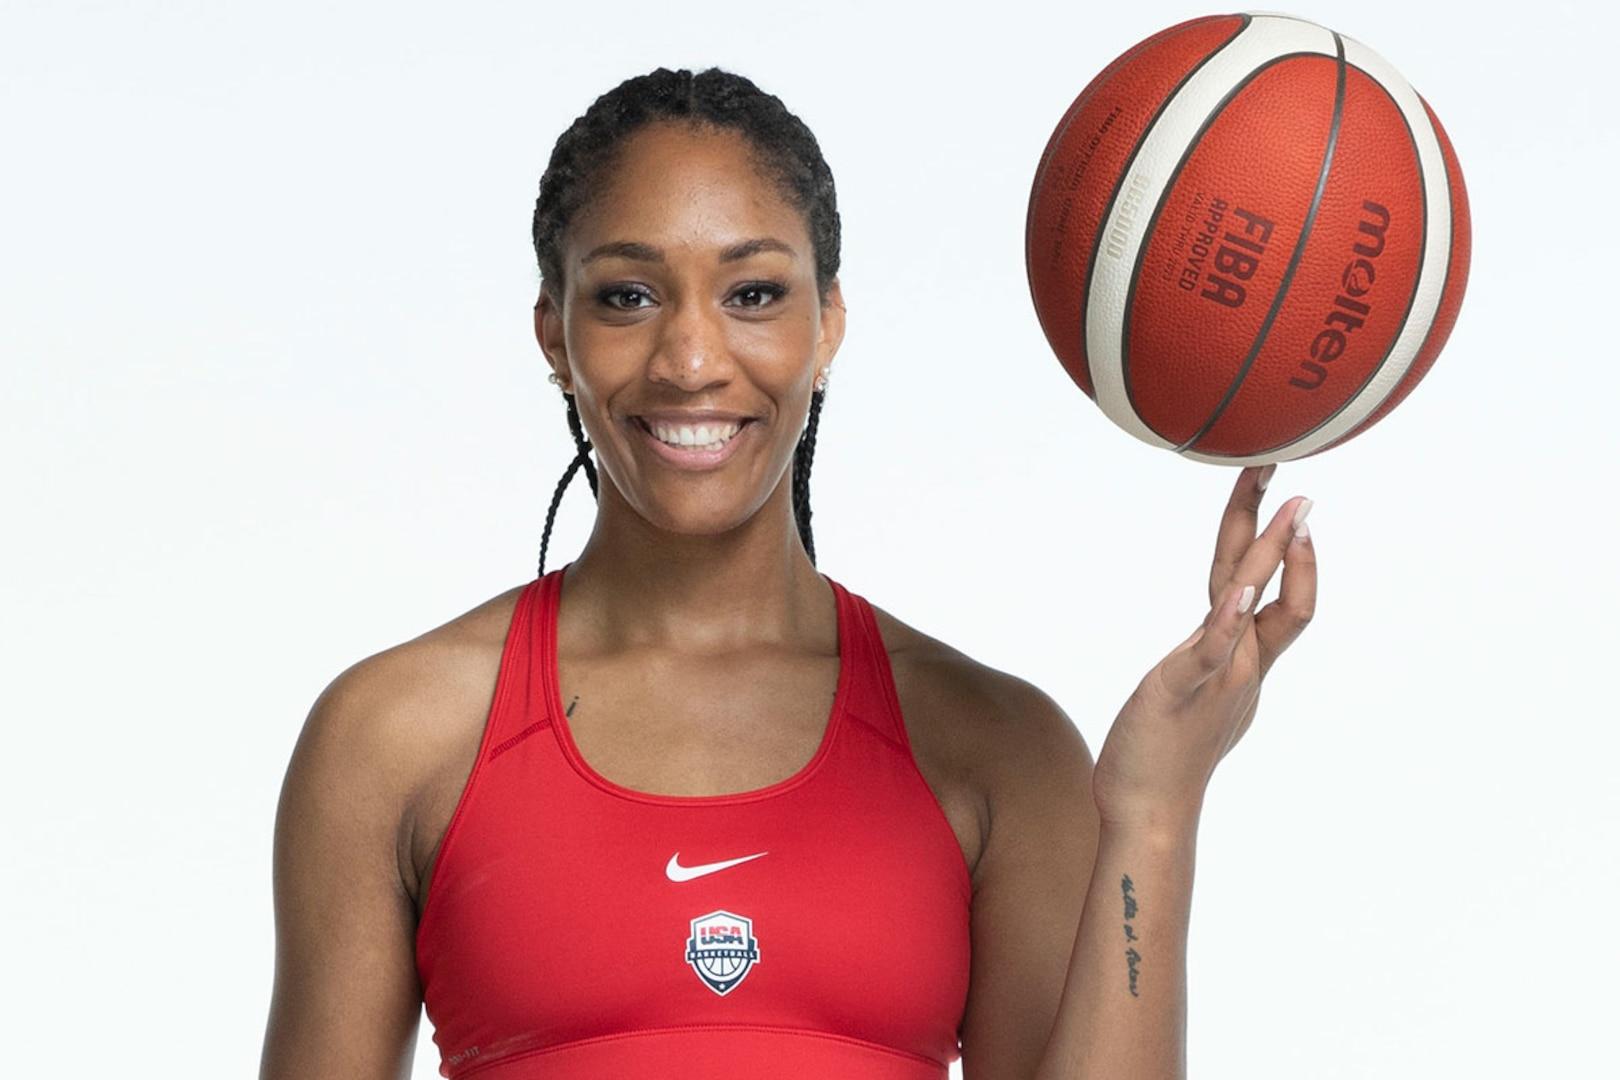 A'ja Wilson balances a basketball and shows the tattoo on her wrist